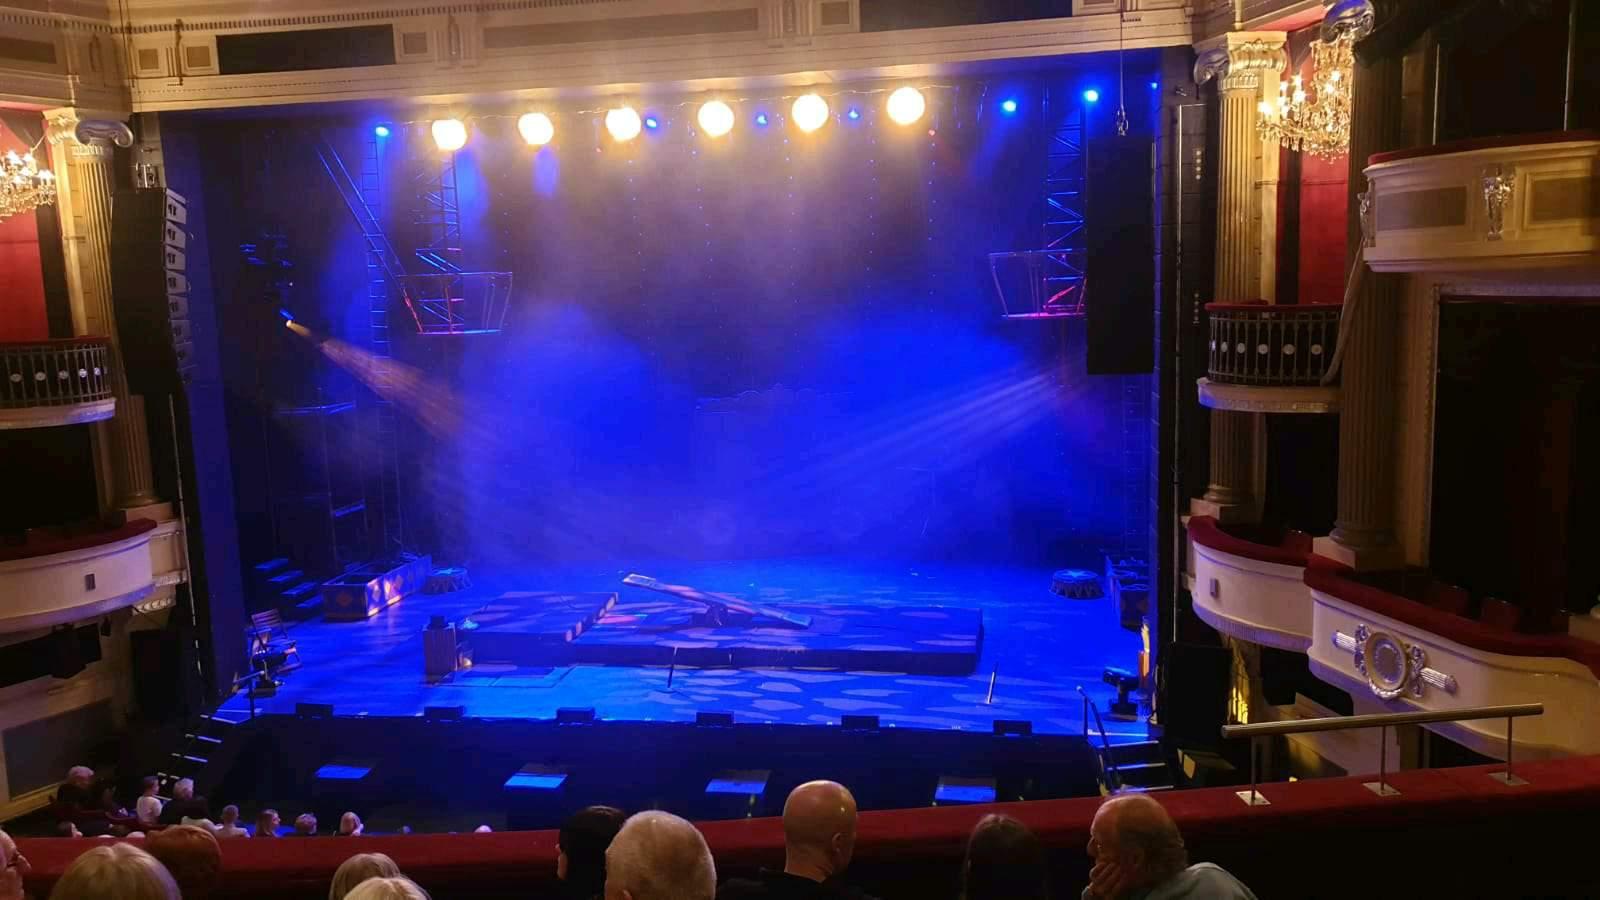 Birmingham Hippodrome Section MIDDLE CIRCLE RIGHT Row E Seat 17